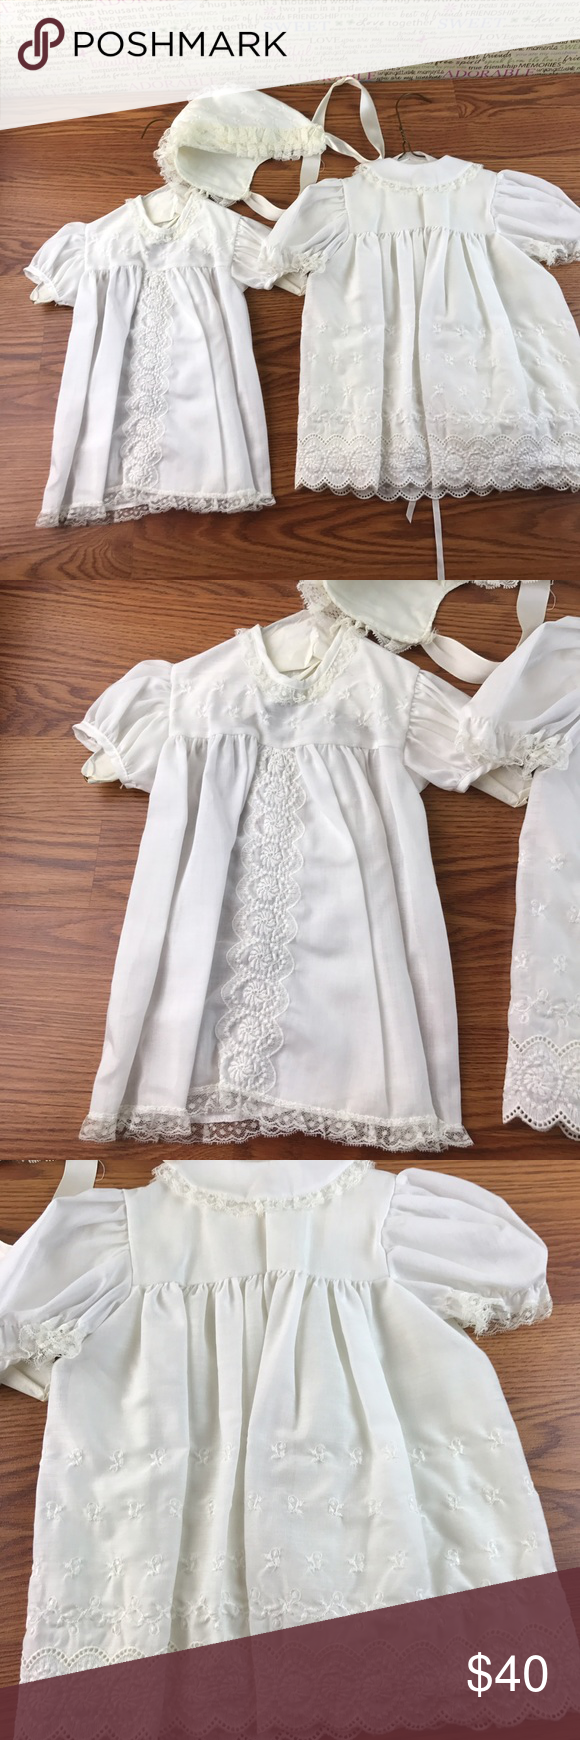 👶vintage 👶babtismal set Vintage babtismal set no stains. Excellent condition madonna by hadad Dresses